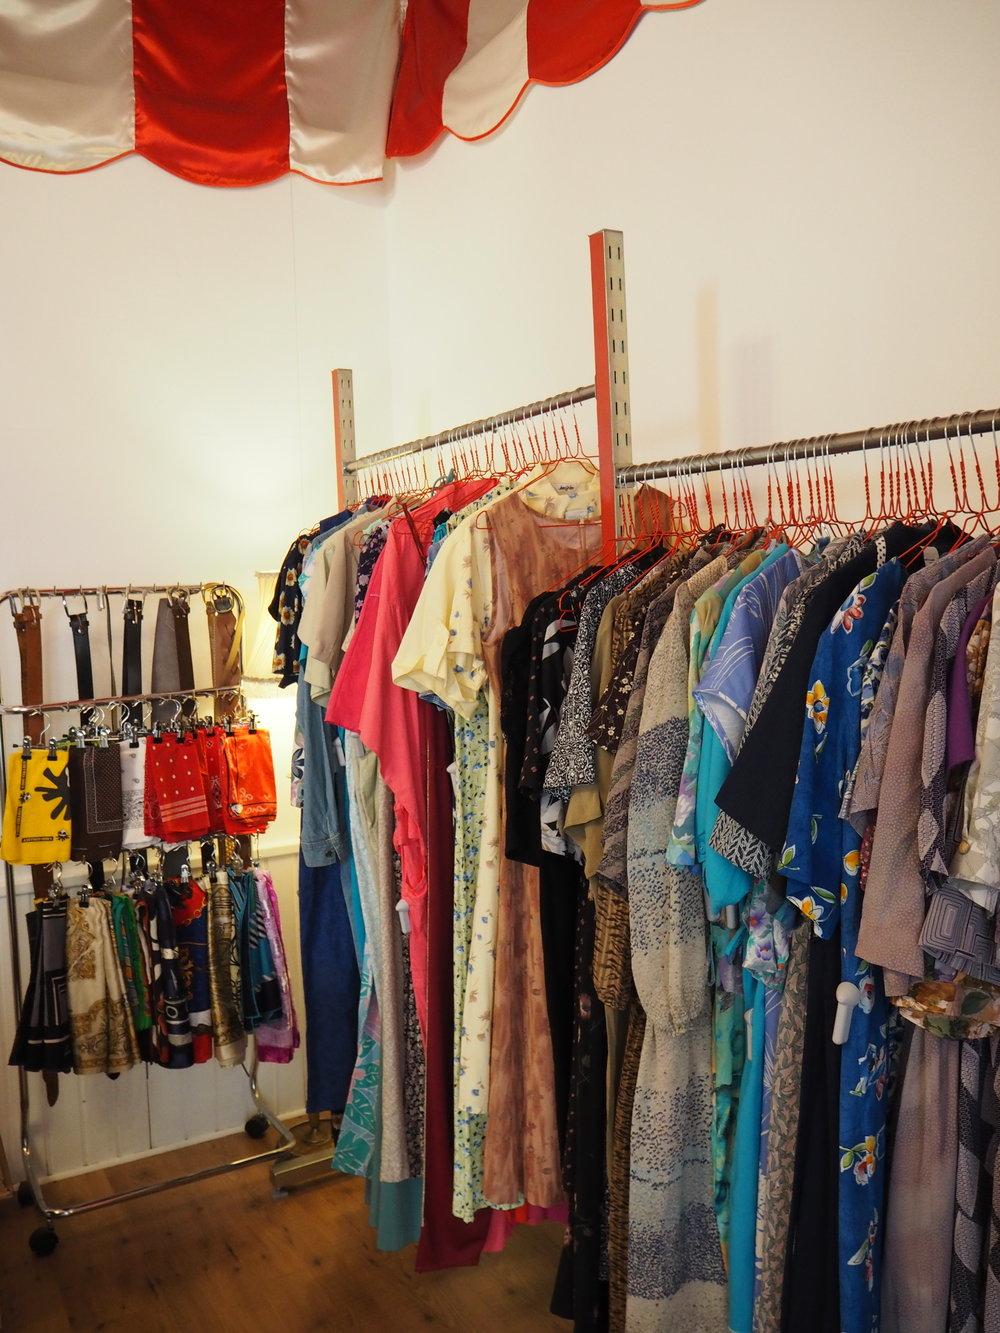 tiendas-ropa-madrid-originales-mona-checa-mujer.JPG